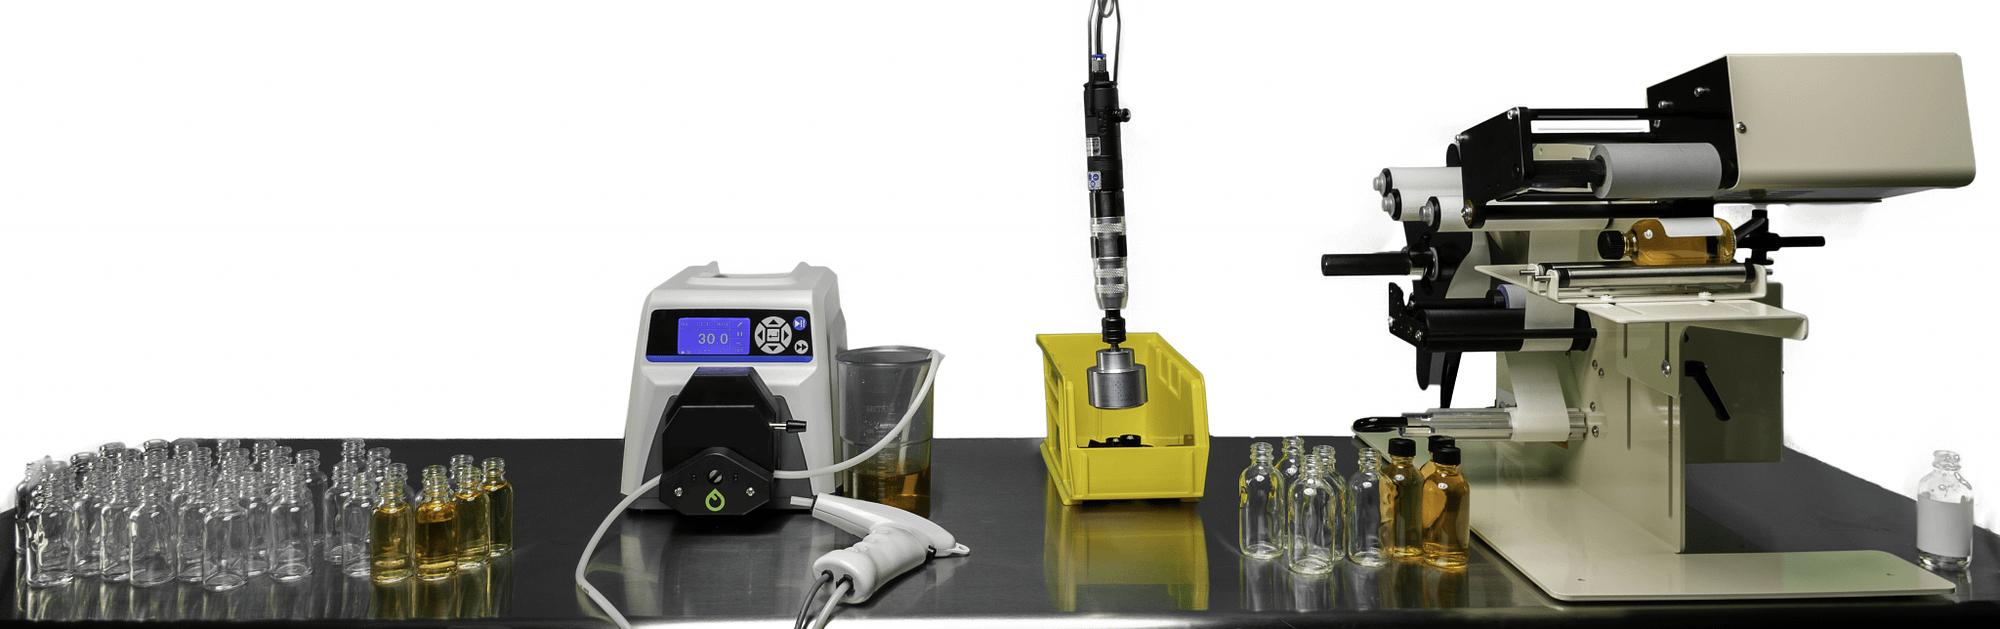 Fluid Solutions Series 1 Peristaltic Filler Line